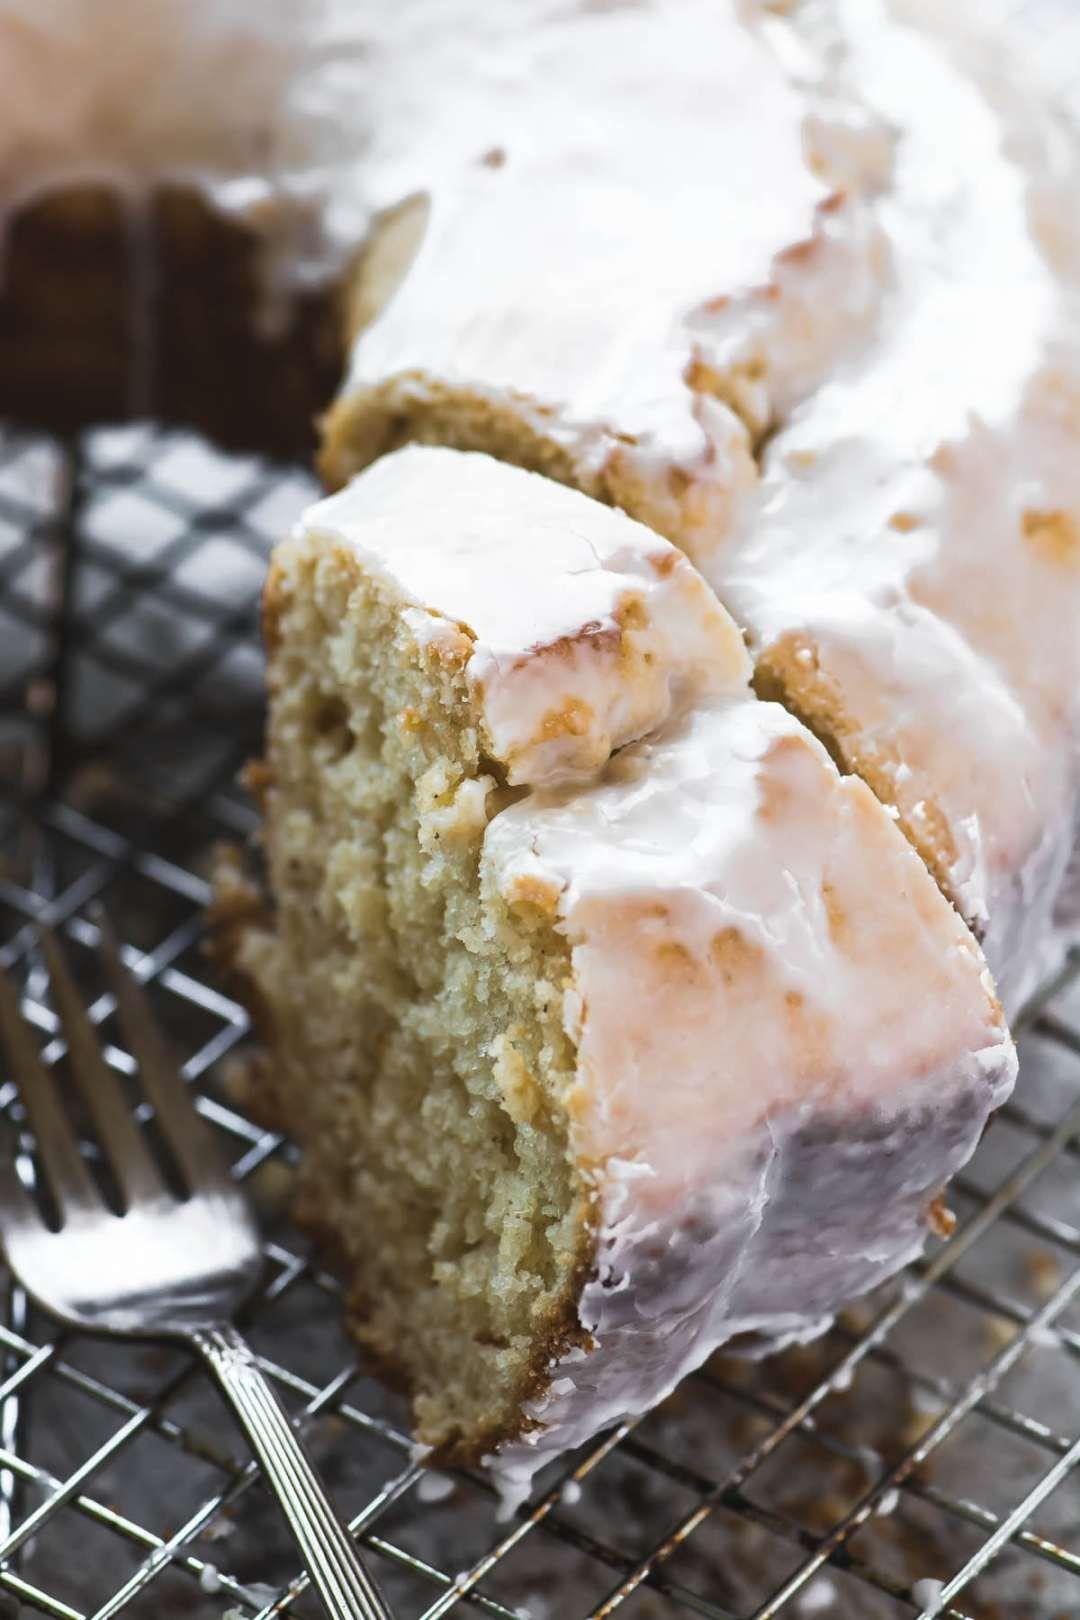 Glazed Buttermilk Doughnut Bundt Cake Recipe The Perfect Breakfast Or Brunch Treat Cake Bundt Ea Buttermilk Recipes Coffee Cake Bundt Bundt Cakes Recipes